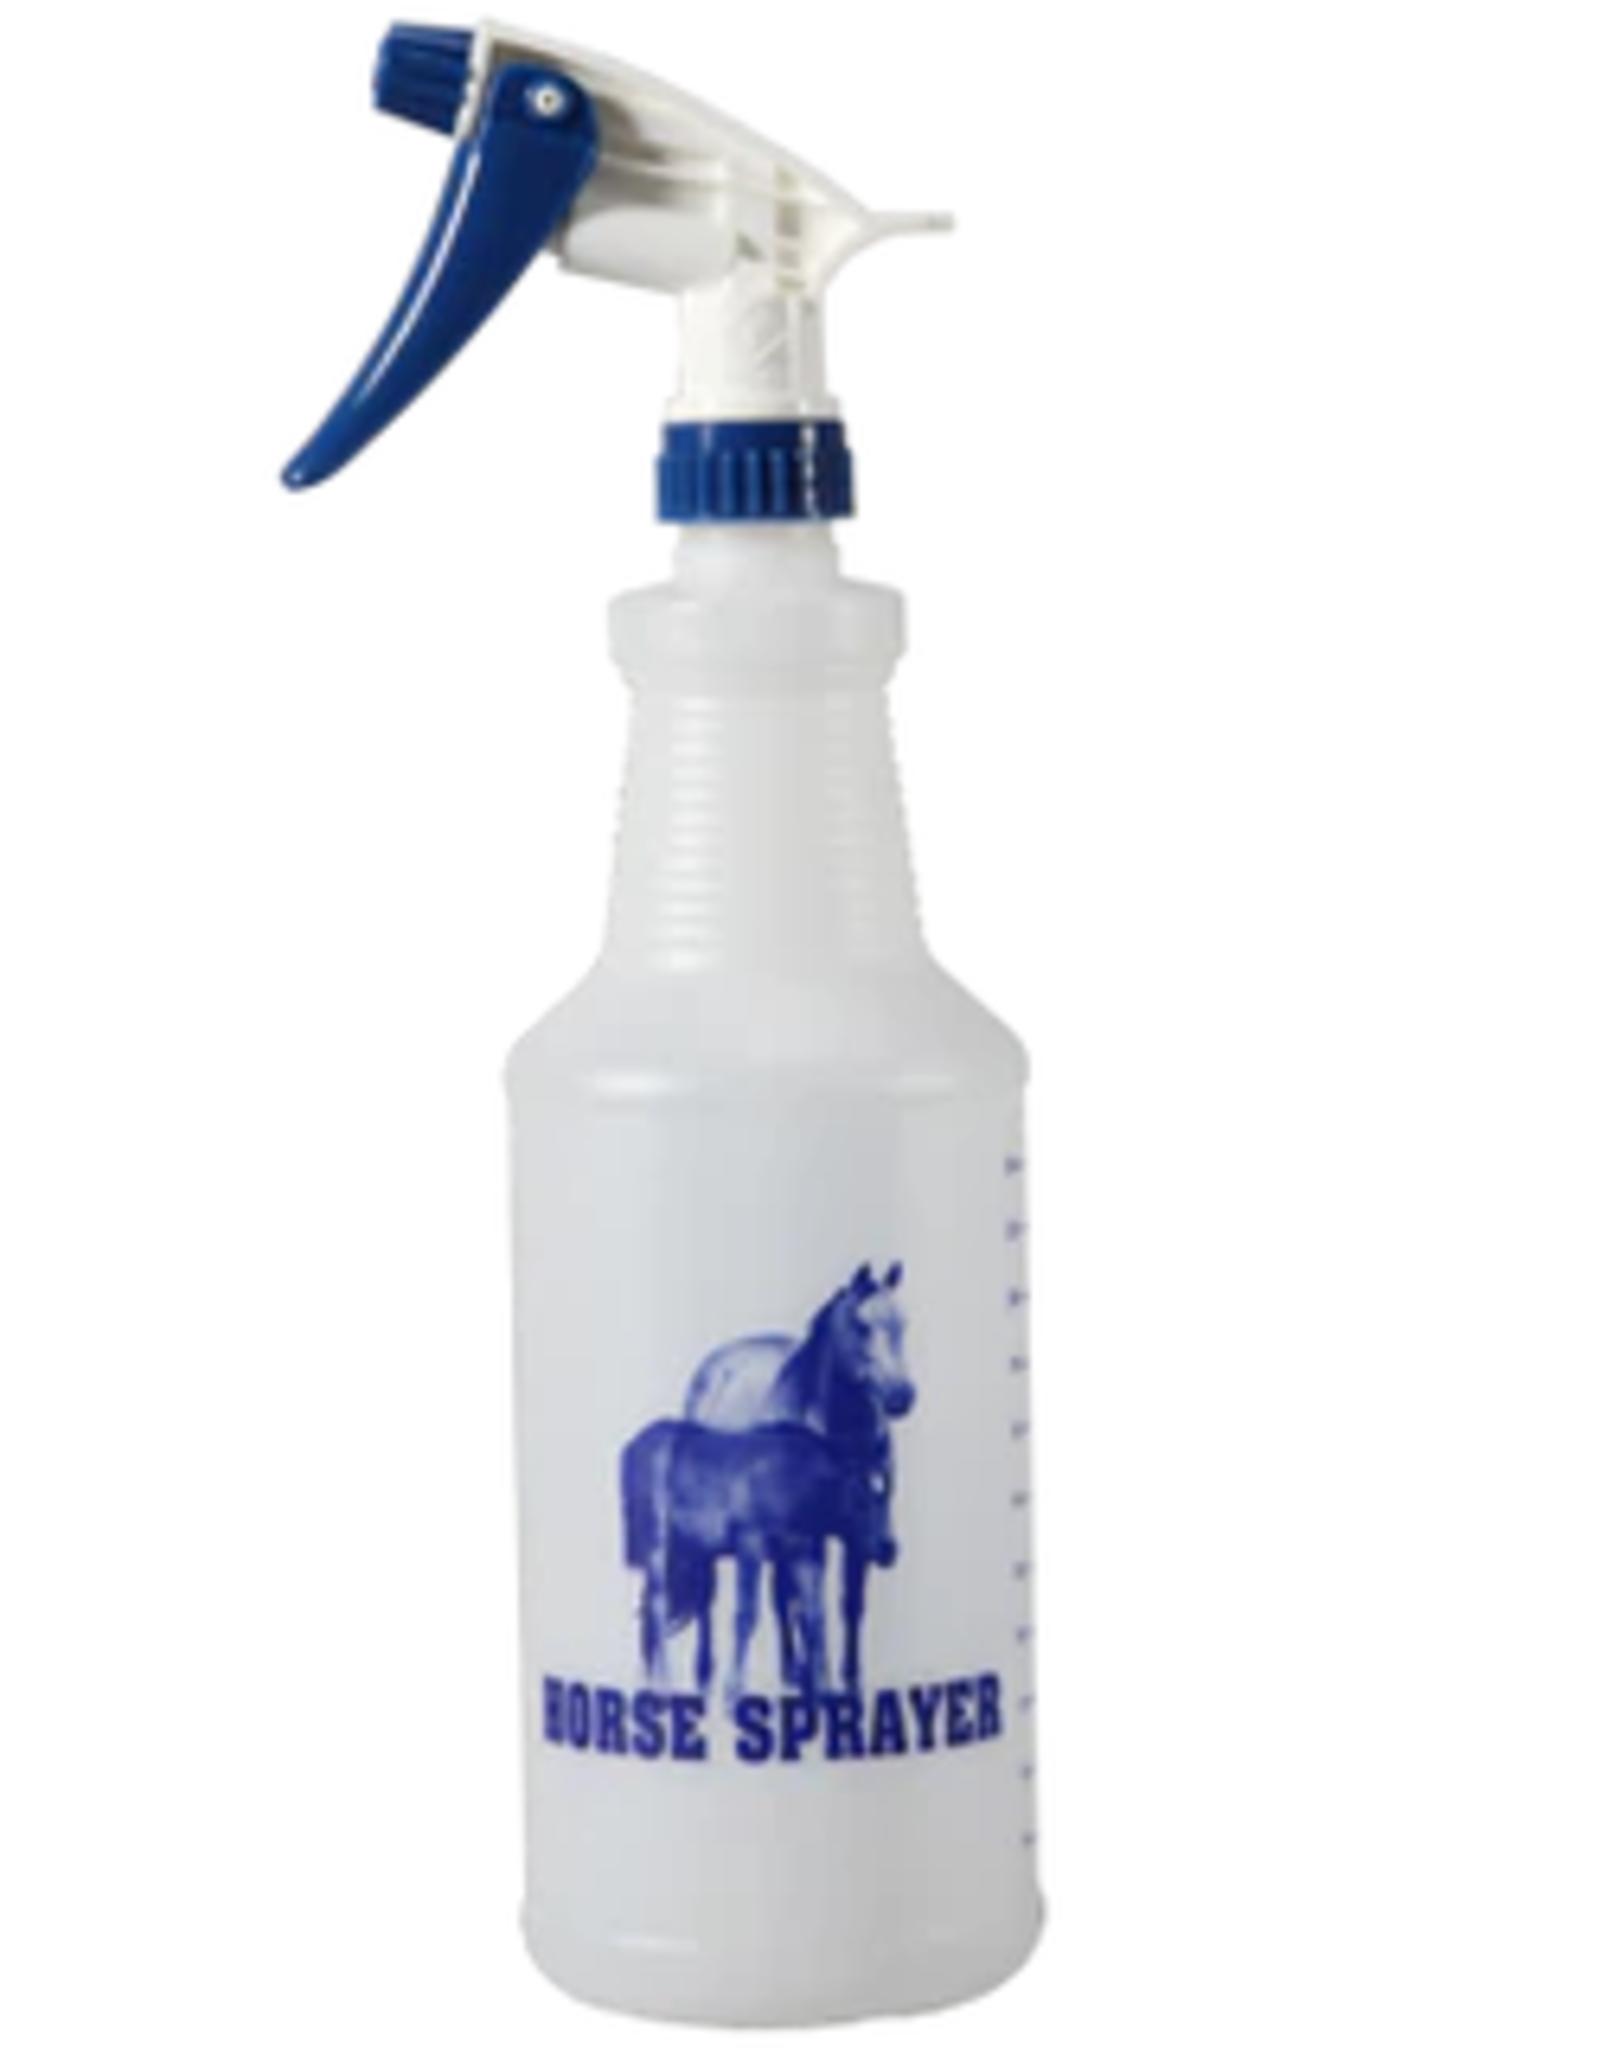 SPRAY BOTTLE - 32OZ - WHITE/BLUE